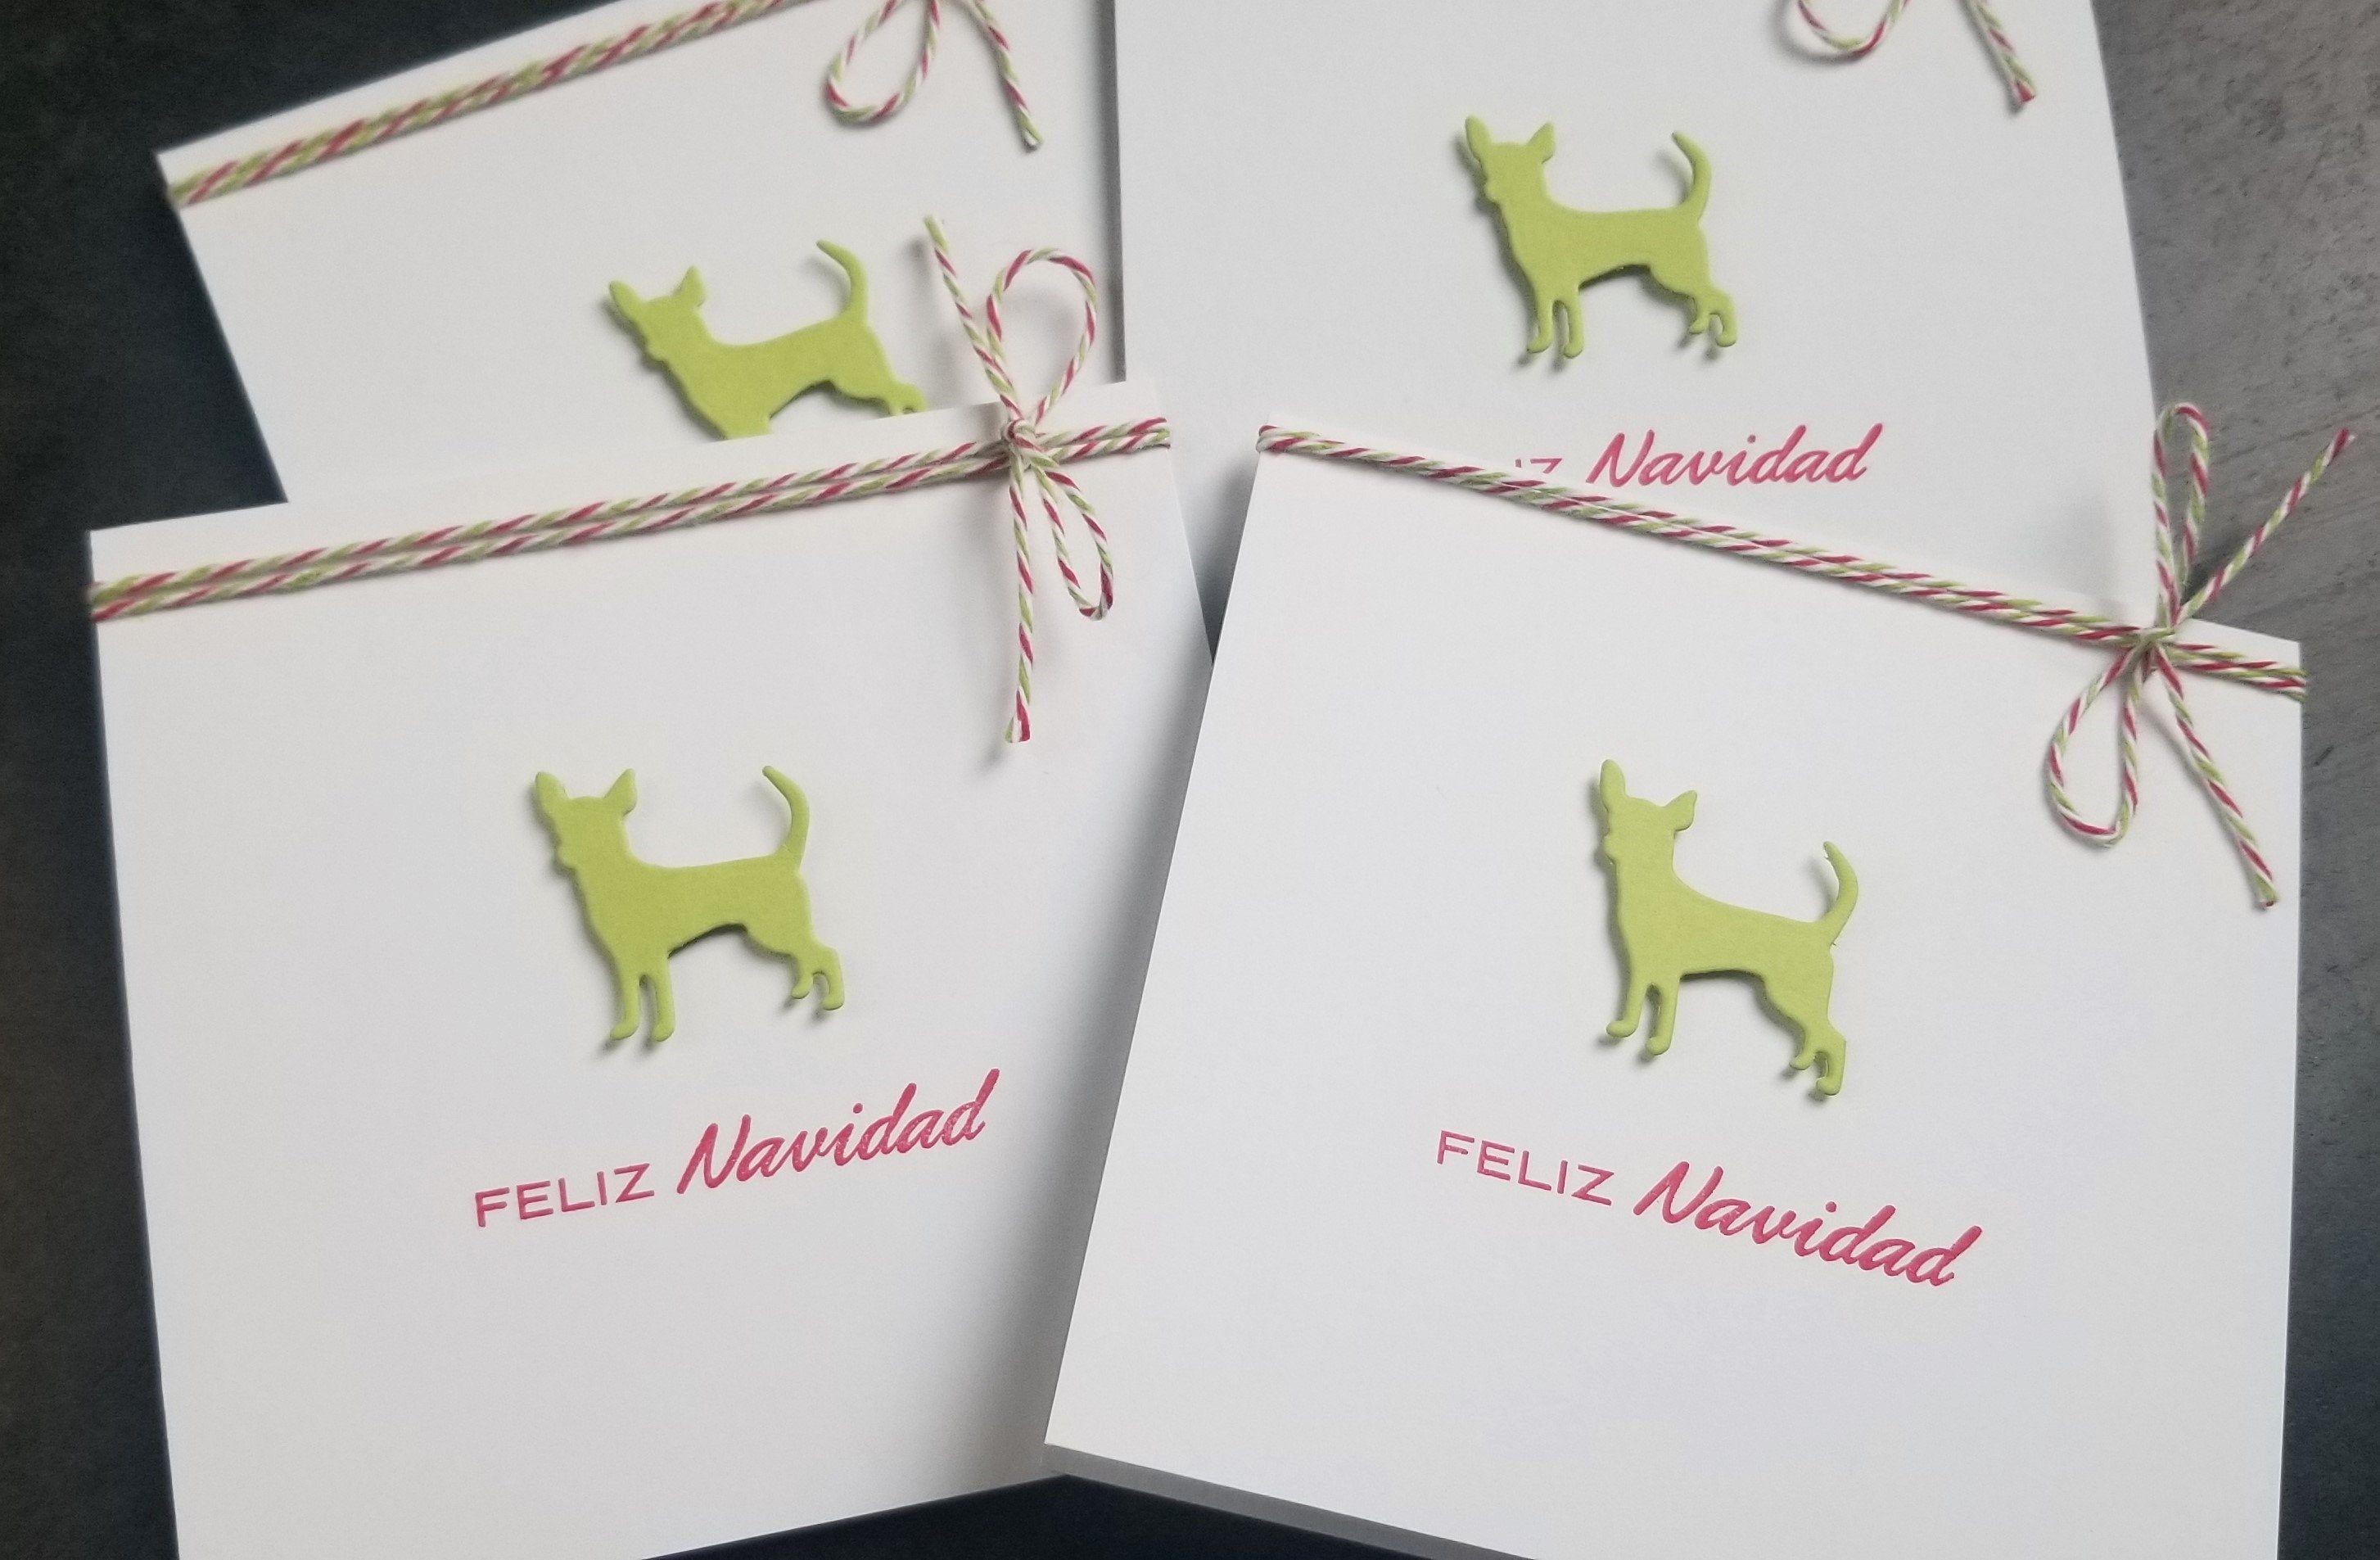 Feliz navidad cards set of 4 spanish christmas cards